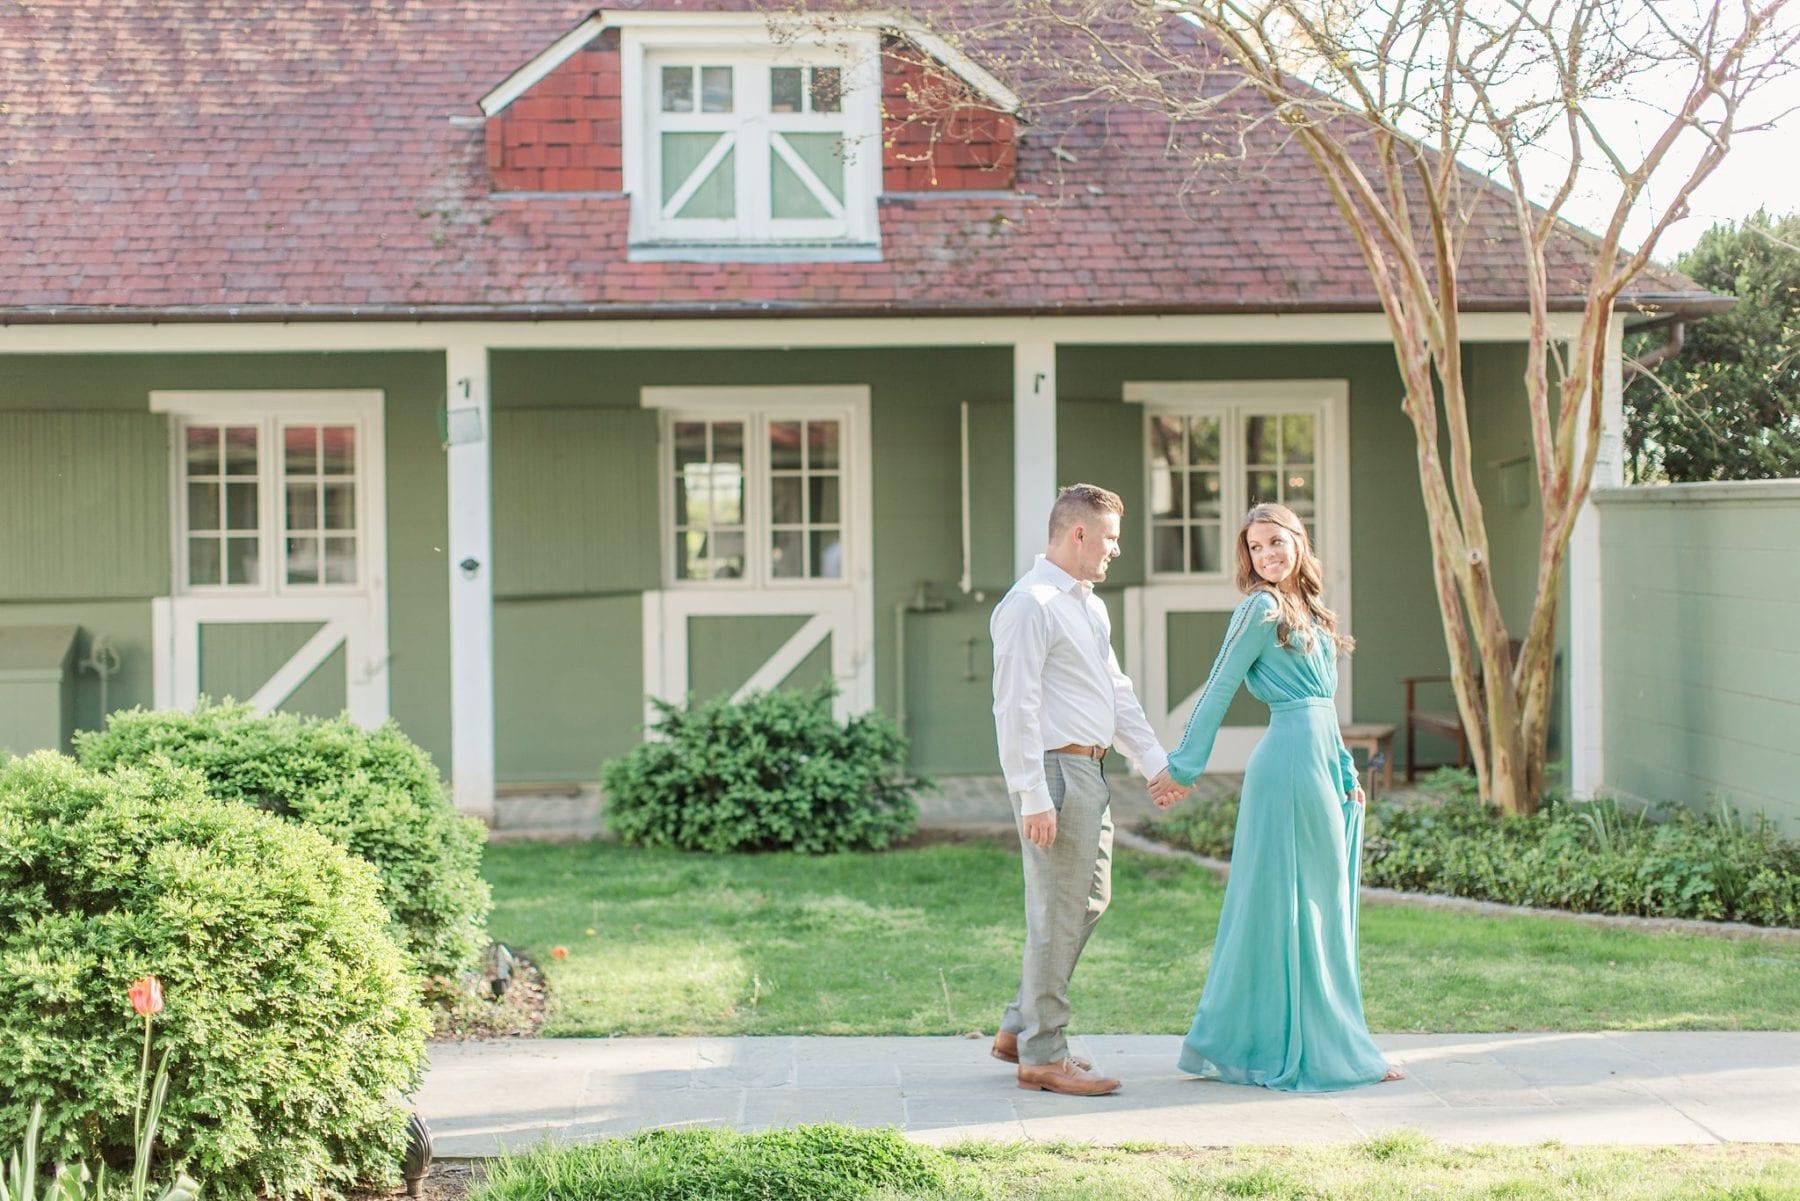 Goodstone Inn Engagement Session Virginia Wedding Photographer Megan Kelsey Photography-85.jpg